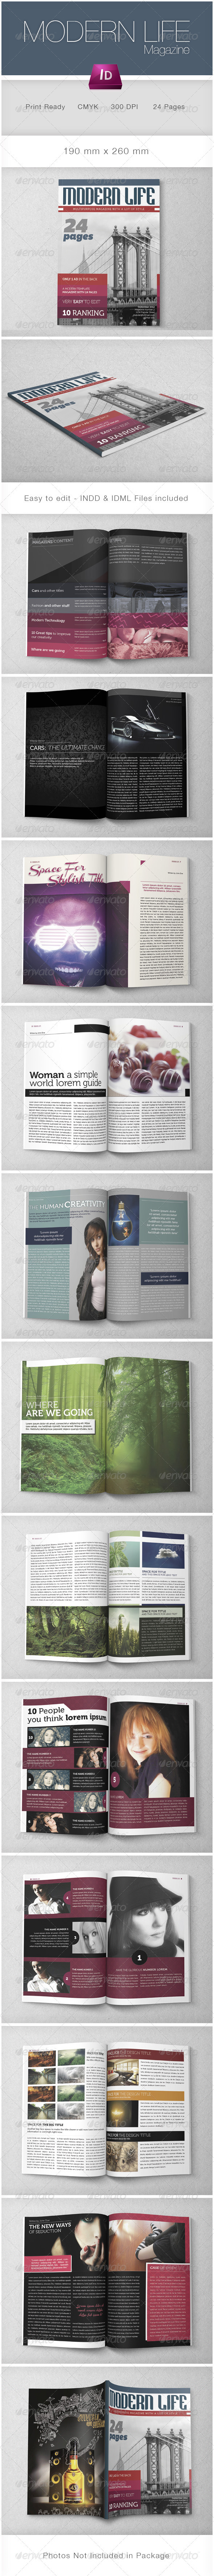 Modern Life Multipurpose Magazine - Magazines Print Templates